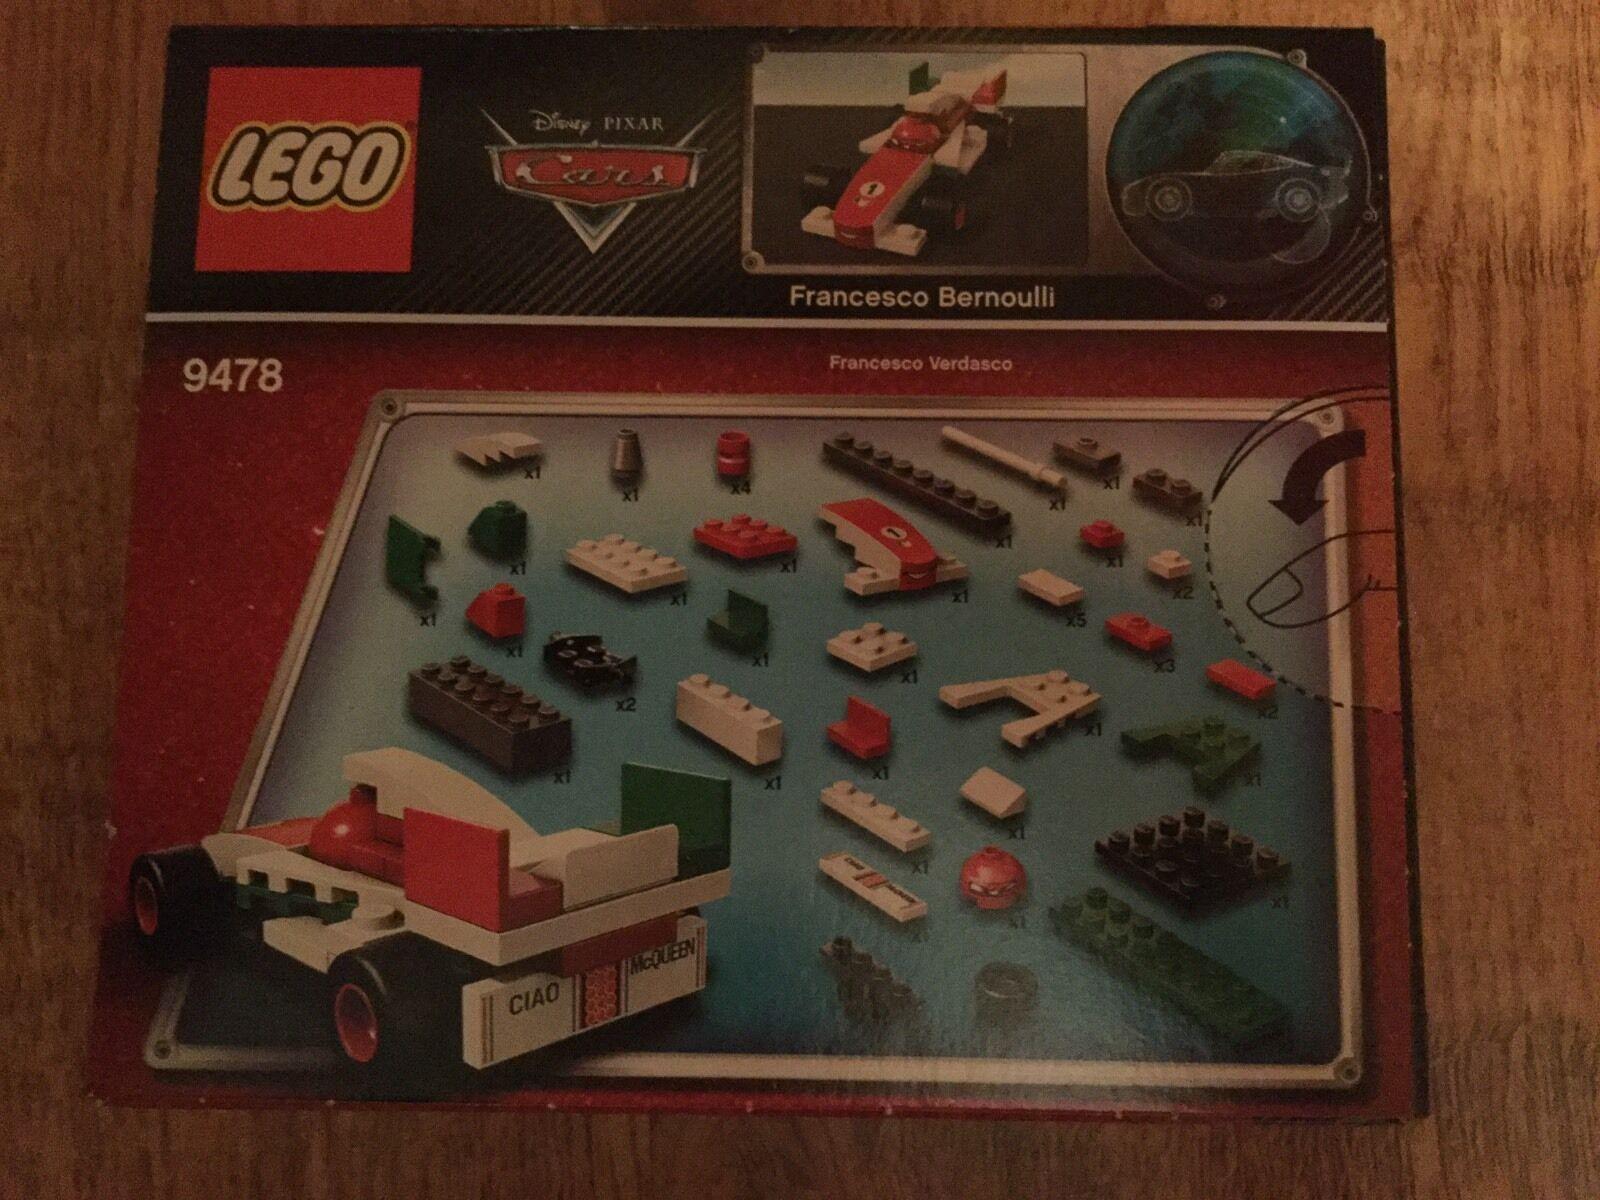 Lego 9478 neu, Cars Francesco Bernoulli neu, 9478 MISB 62c7b4